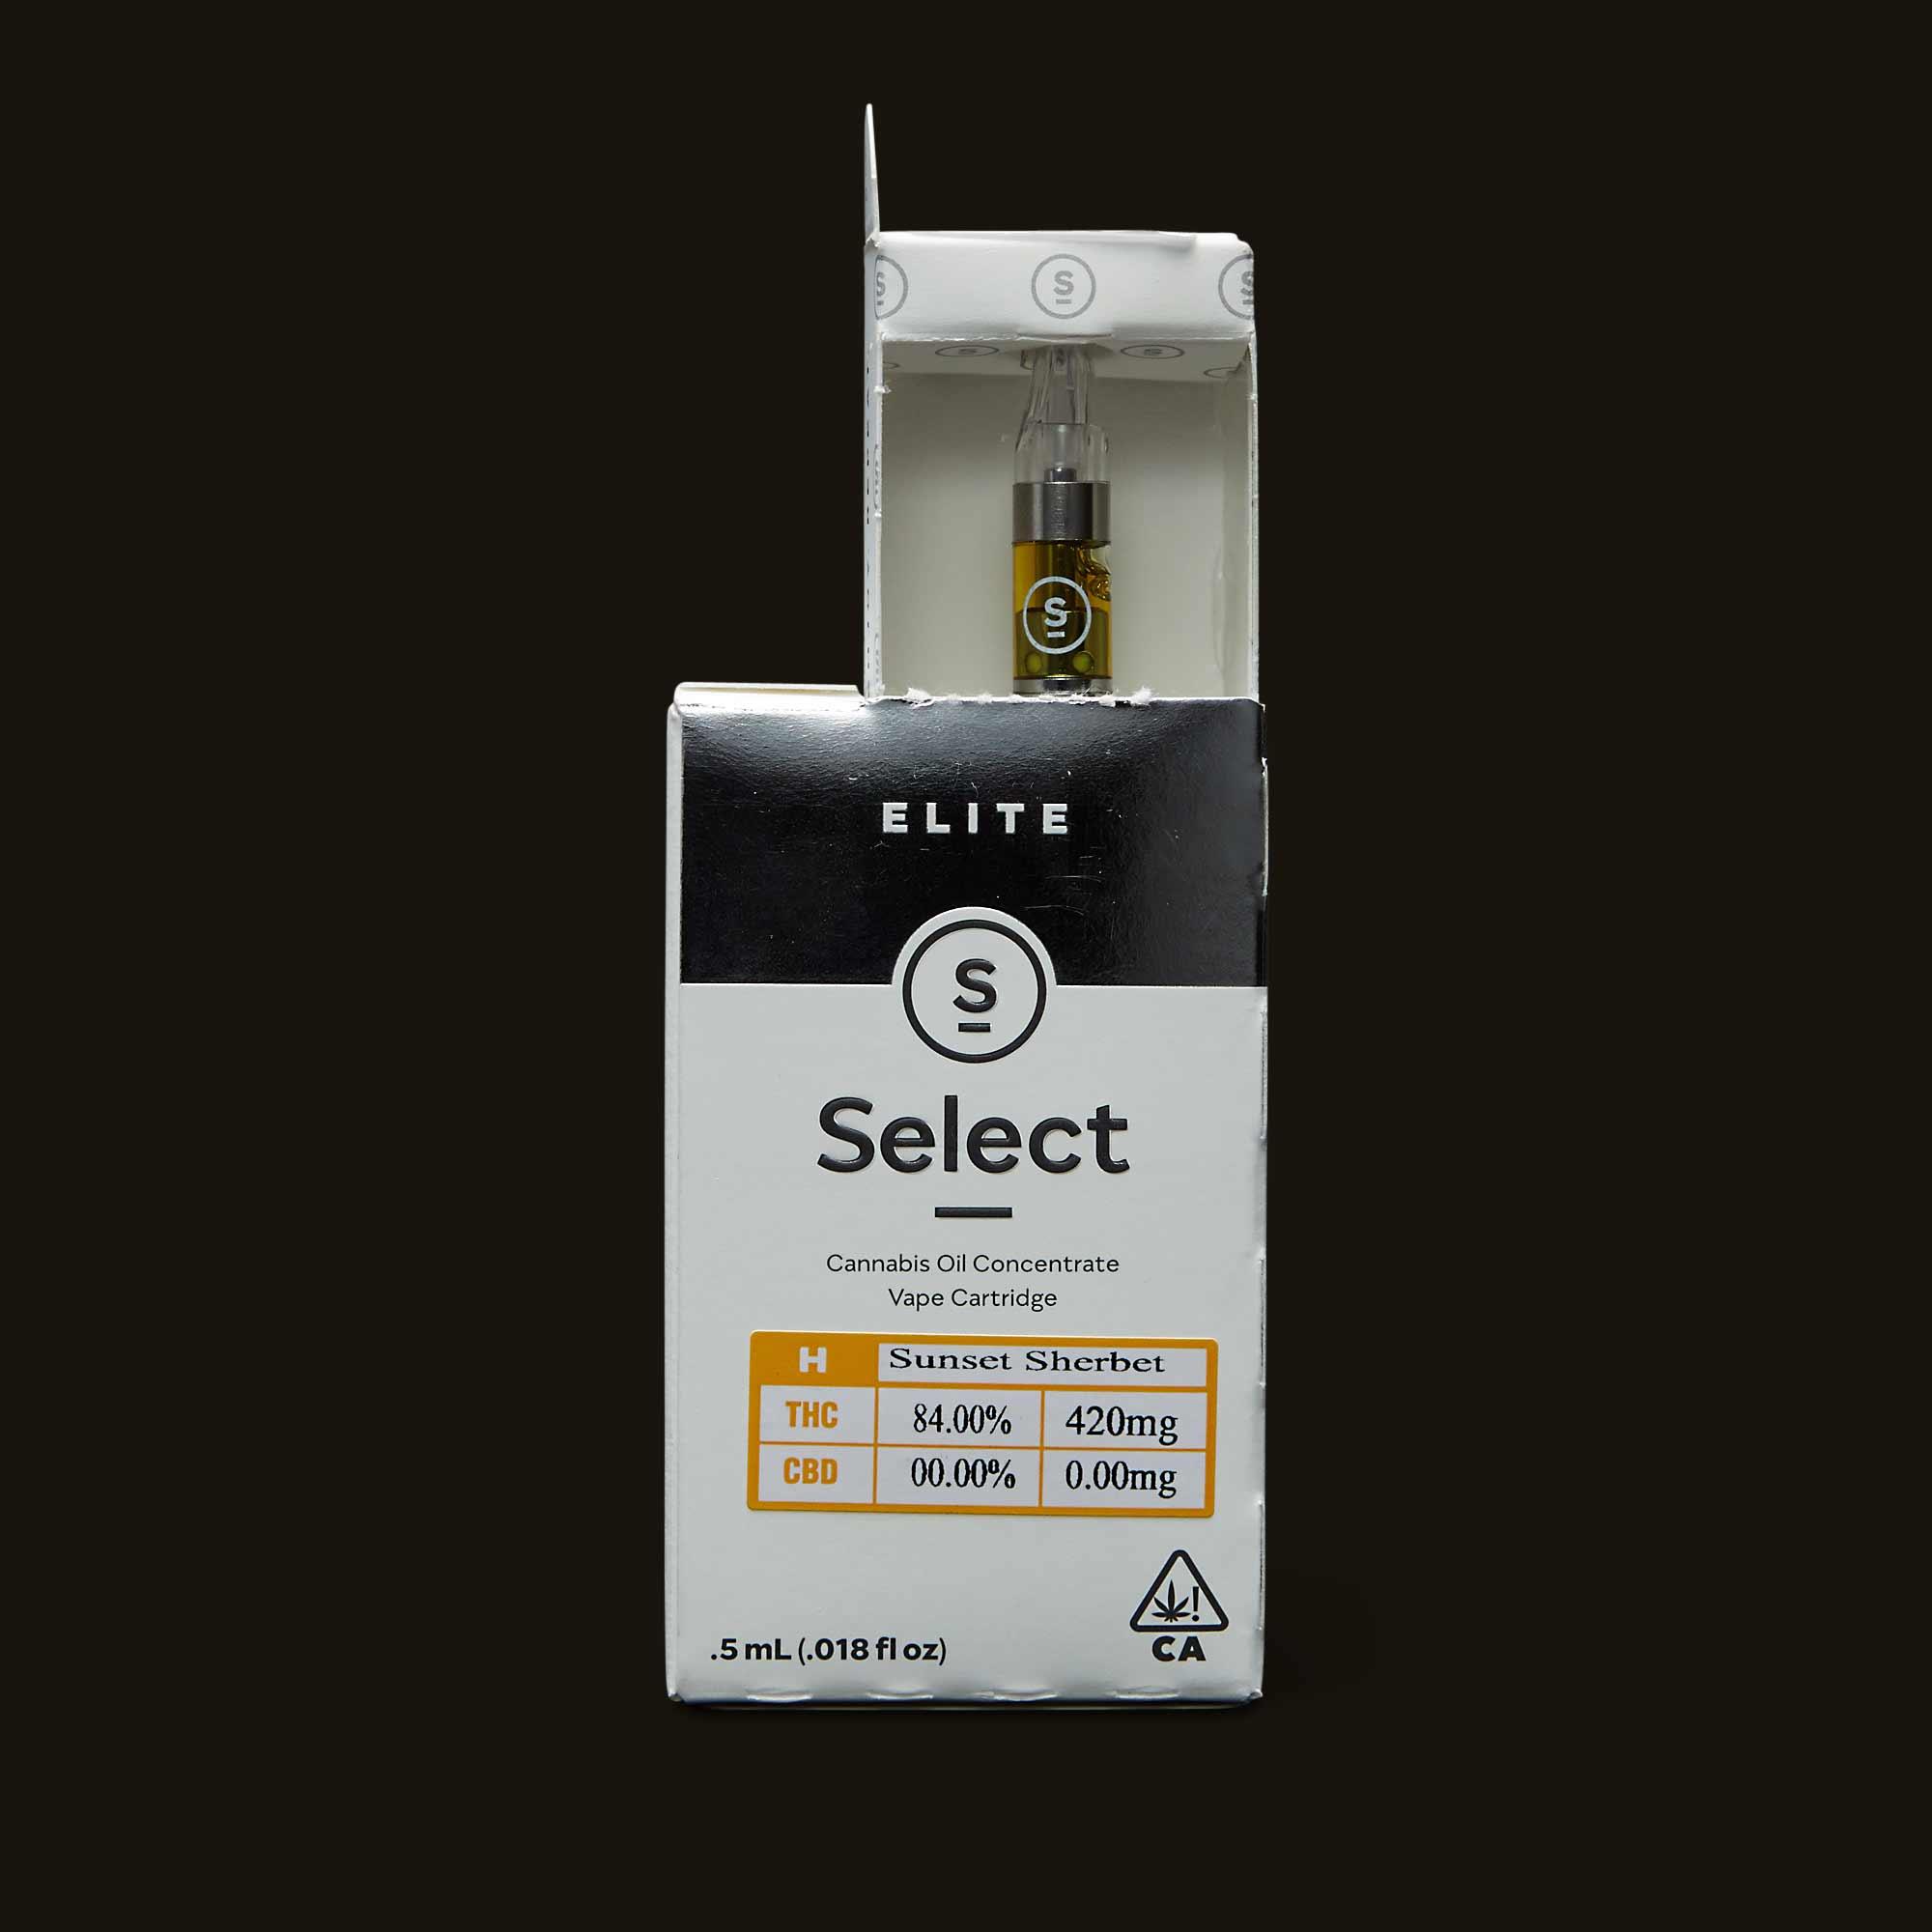 Select Sunset Sherbet Elite Cartridge